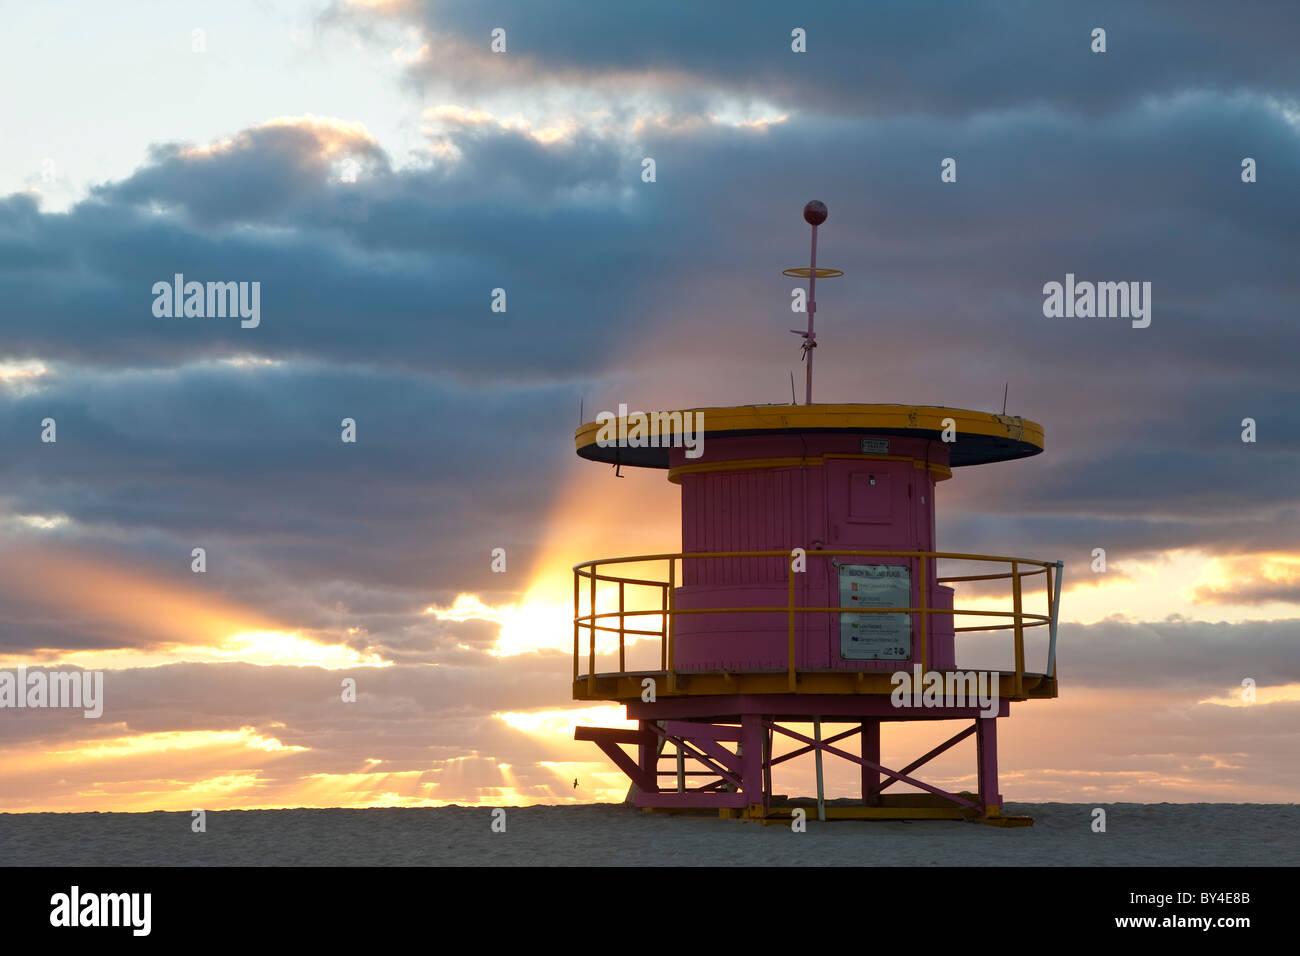 Rettungsschwimmer-Hütte, South Beach, Miami, Florida, USA Stockbild